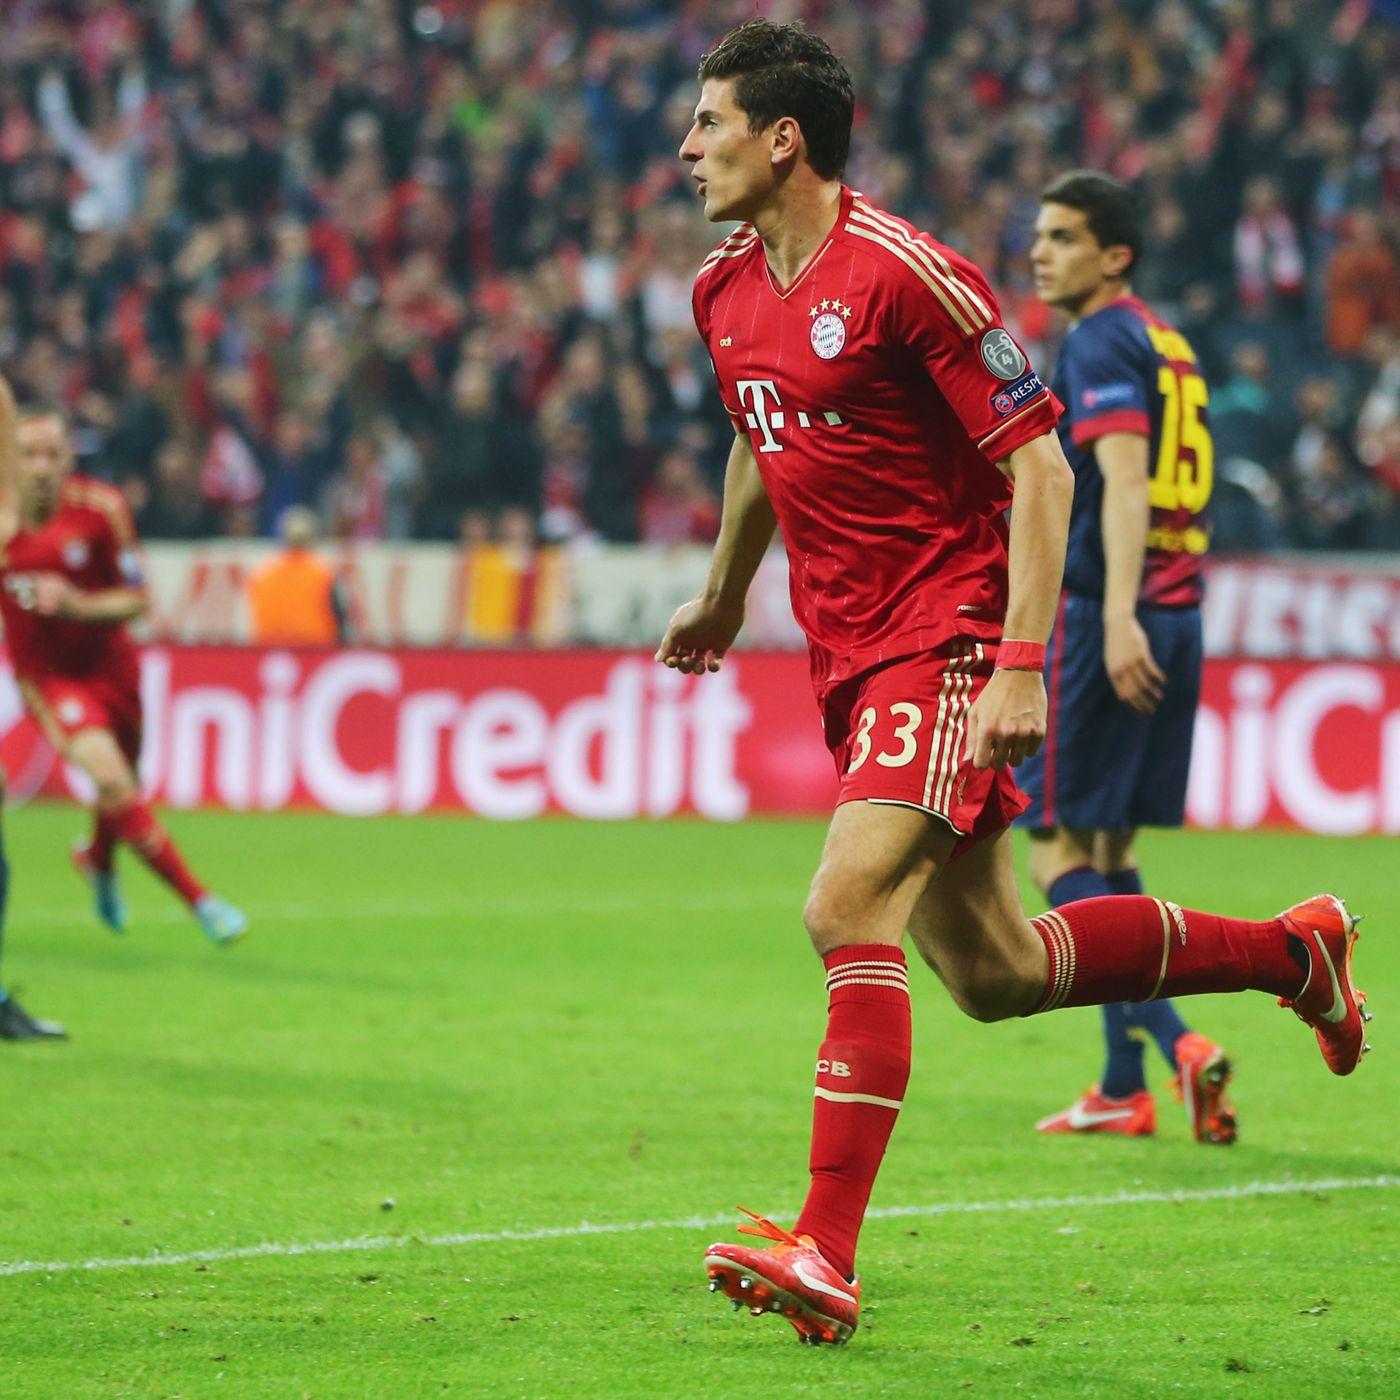 Bayern Munich Vs Barcelona 2013 Uefa Champions League Final Score 4 0 In An All Time Great Demolition Sbnation Com